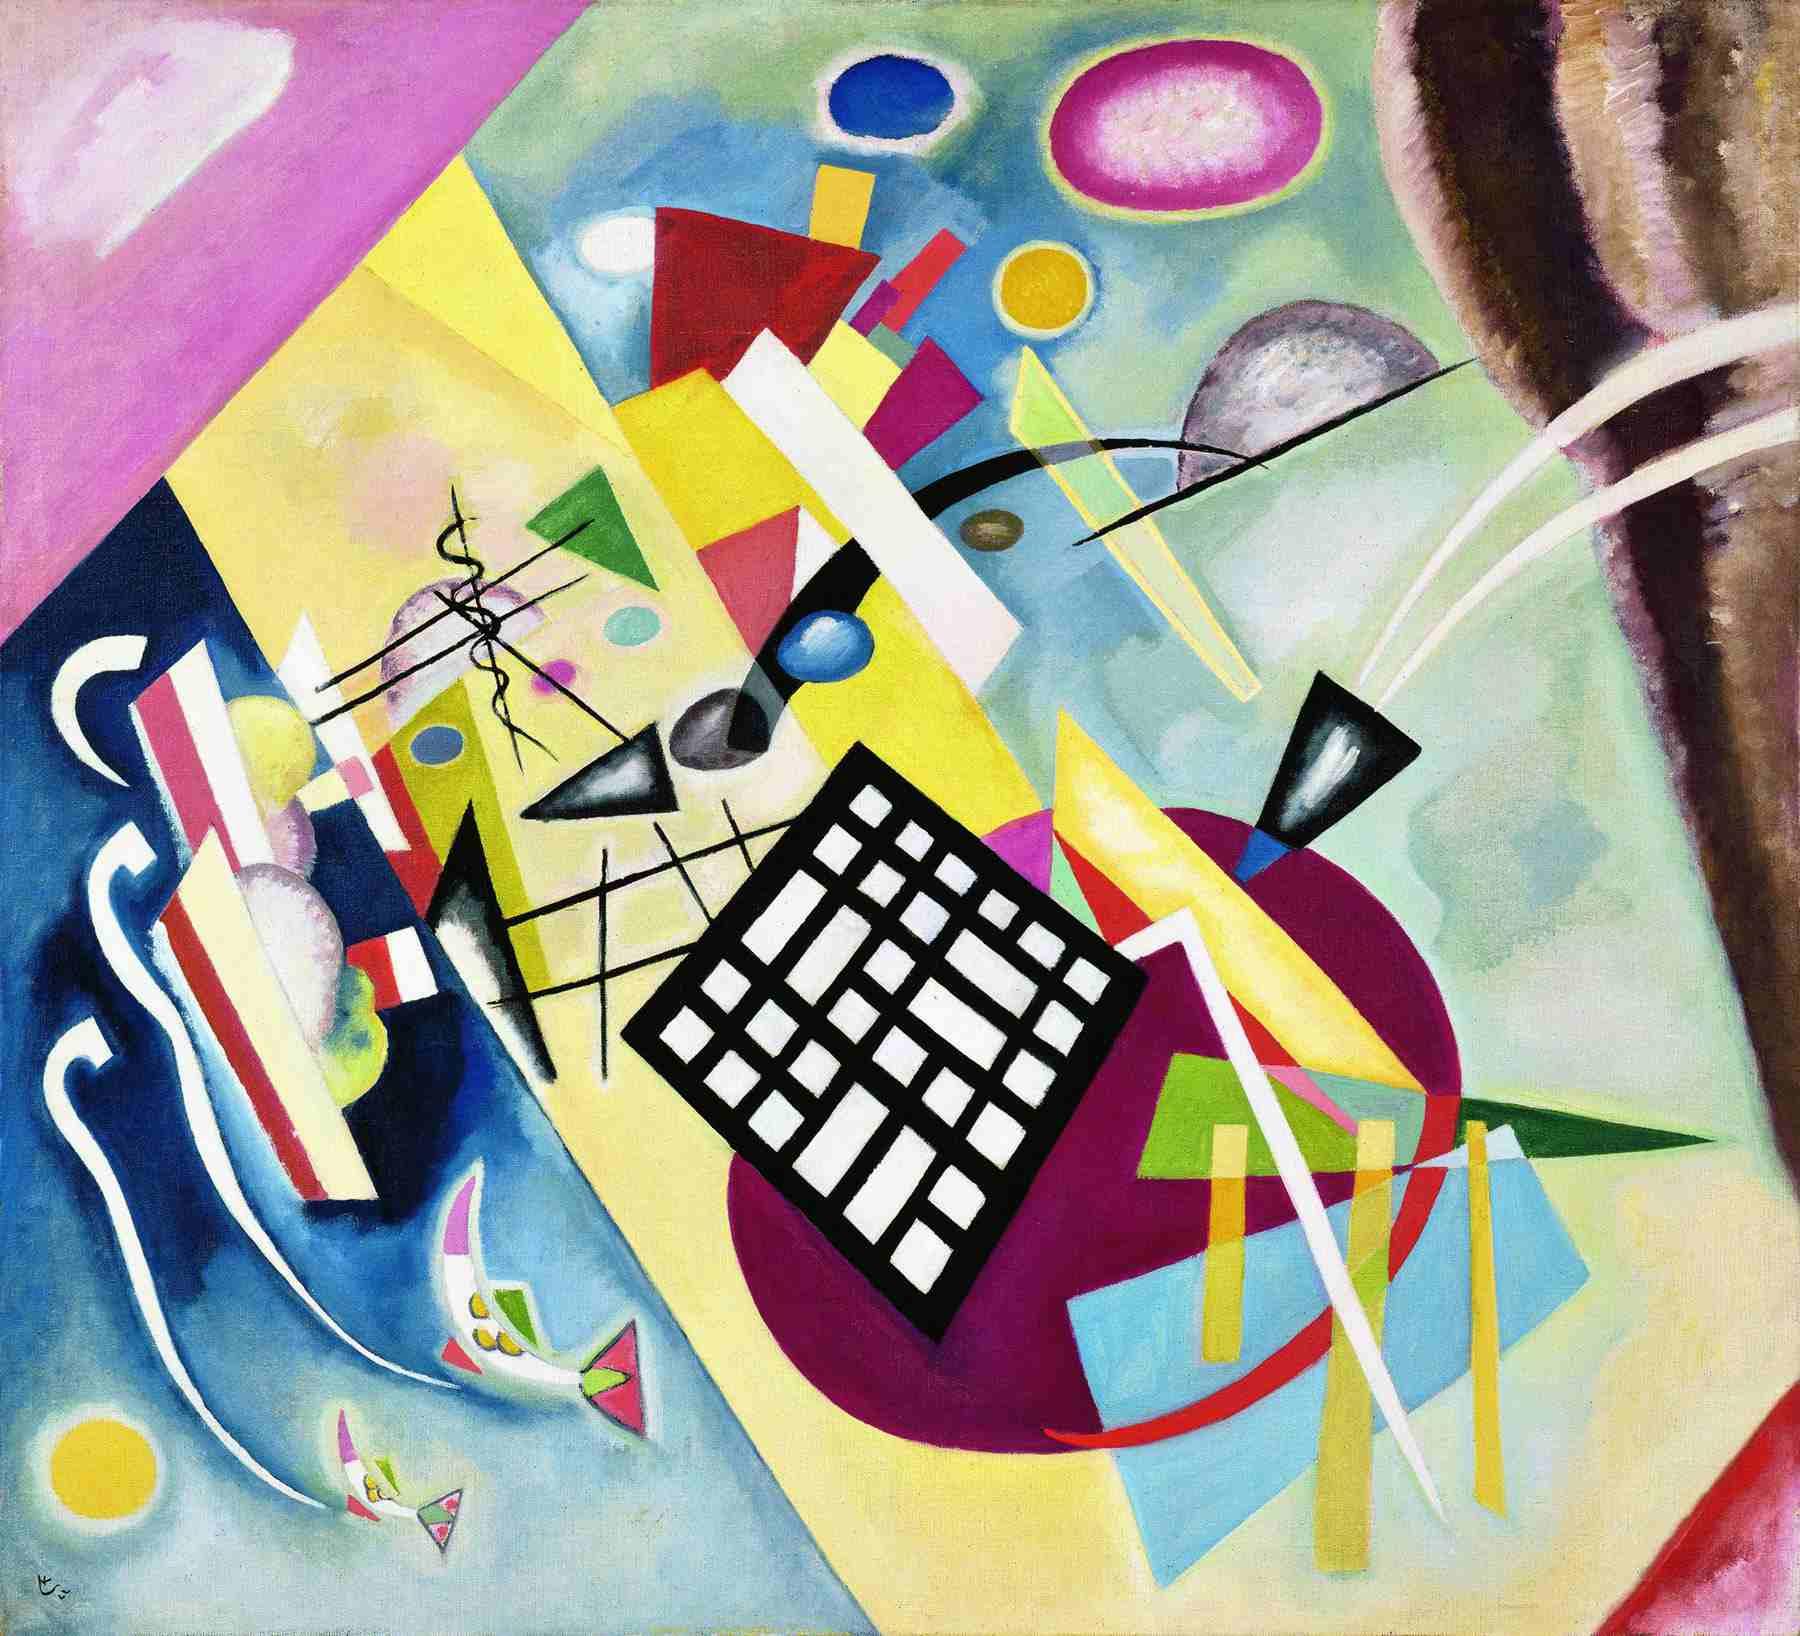 Wassily Kandinsky (Russian, 1866-1944) Wassily Kandinsky (Russian, 1866-1944). Black Grid (Schwarzer Raster), 1922. Oil on canvas. 37 3/4 x 41 11/16 in. (96 x 106 cm). Bequest of Nina Kandinsky, 1981. Musée national d'art moderne, Centre Pompidou, Paris.